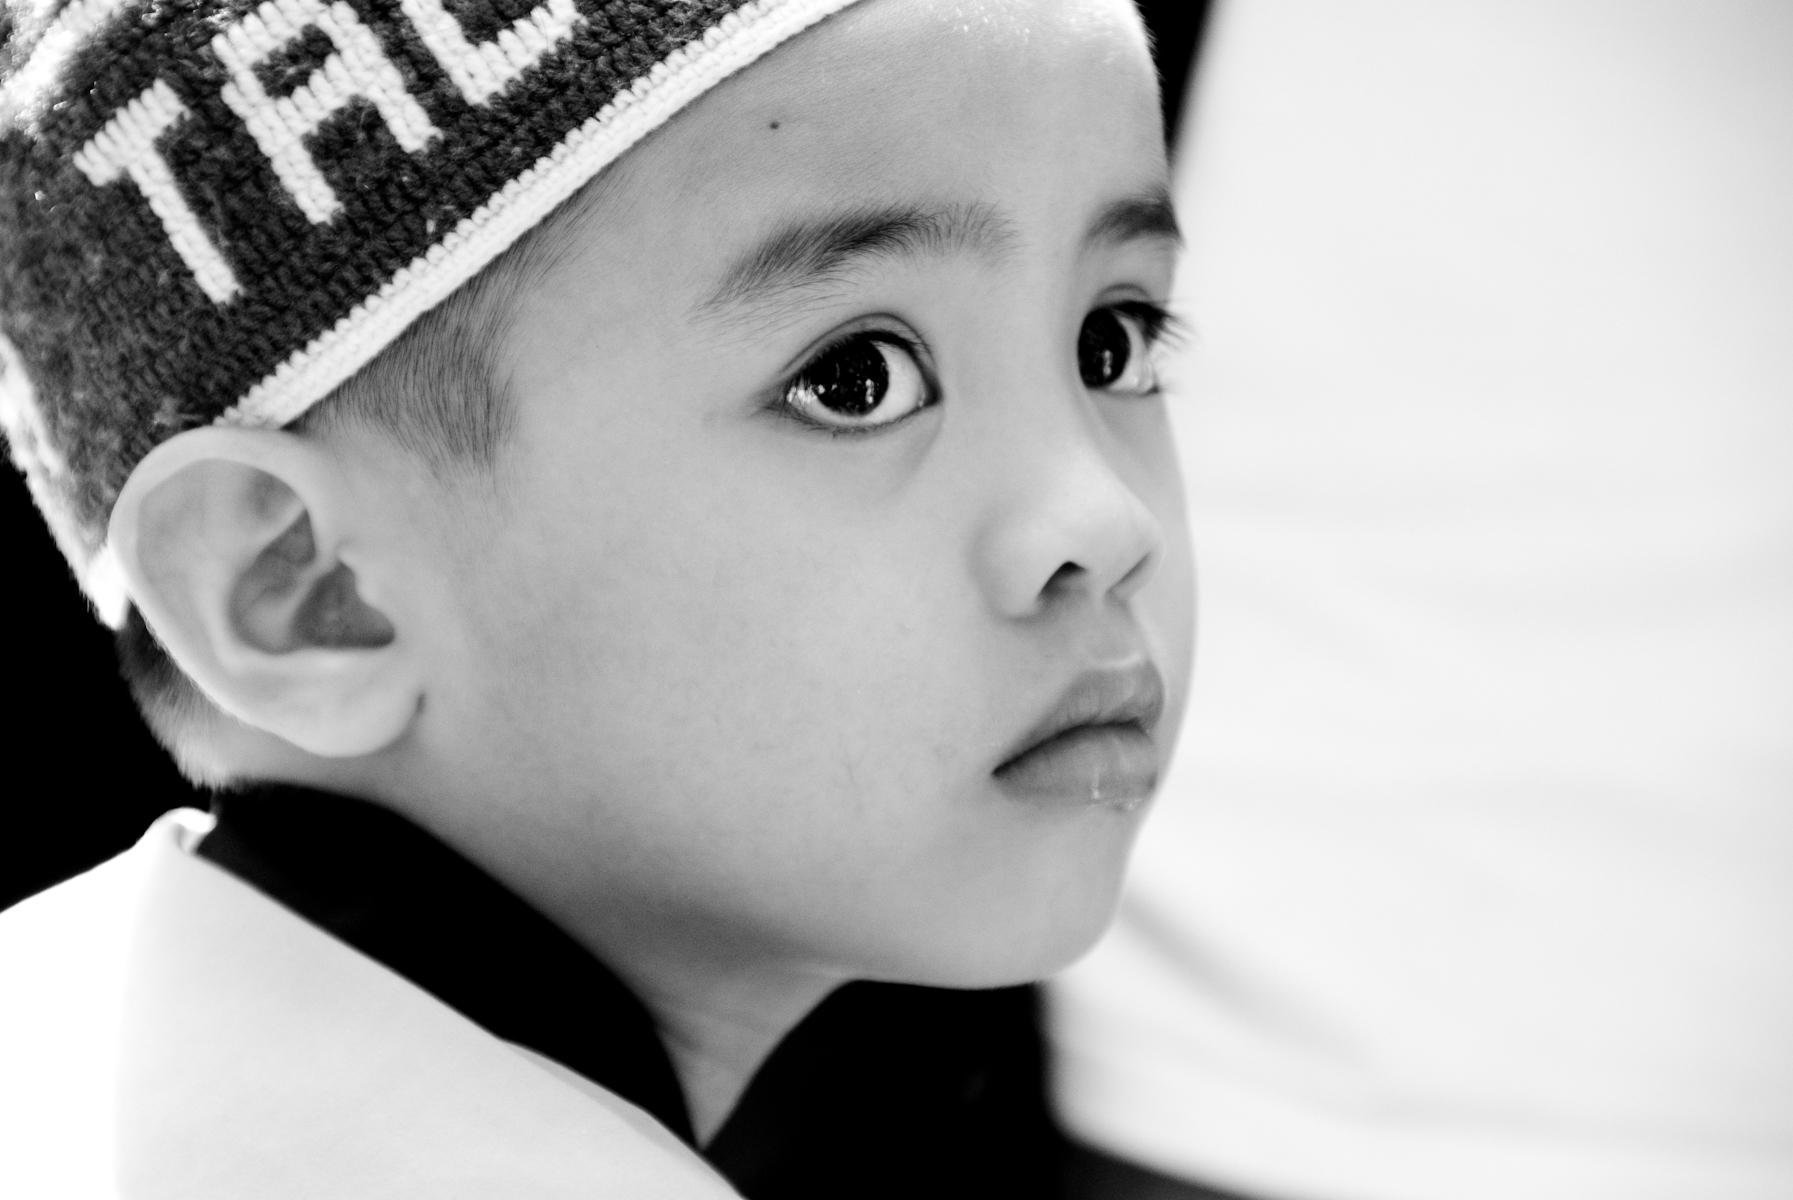 Malaysian boy